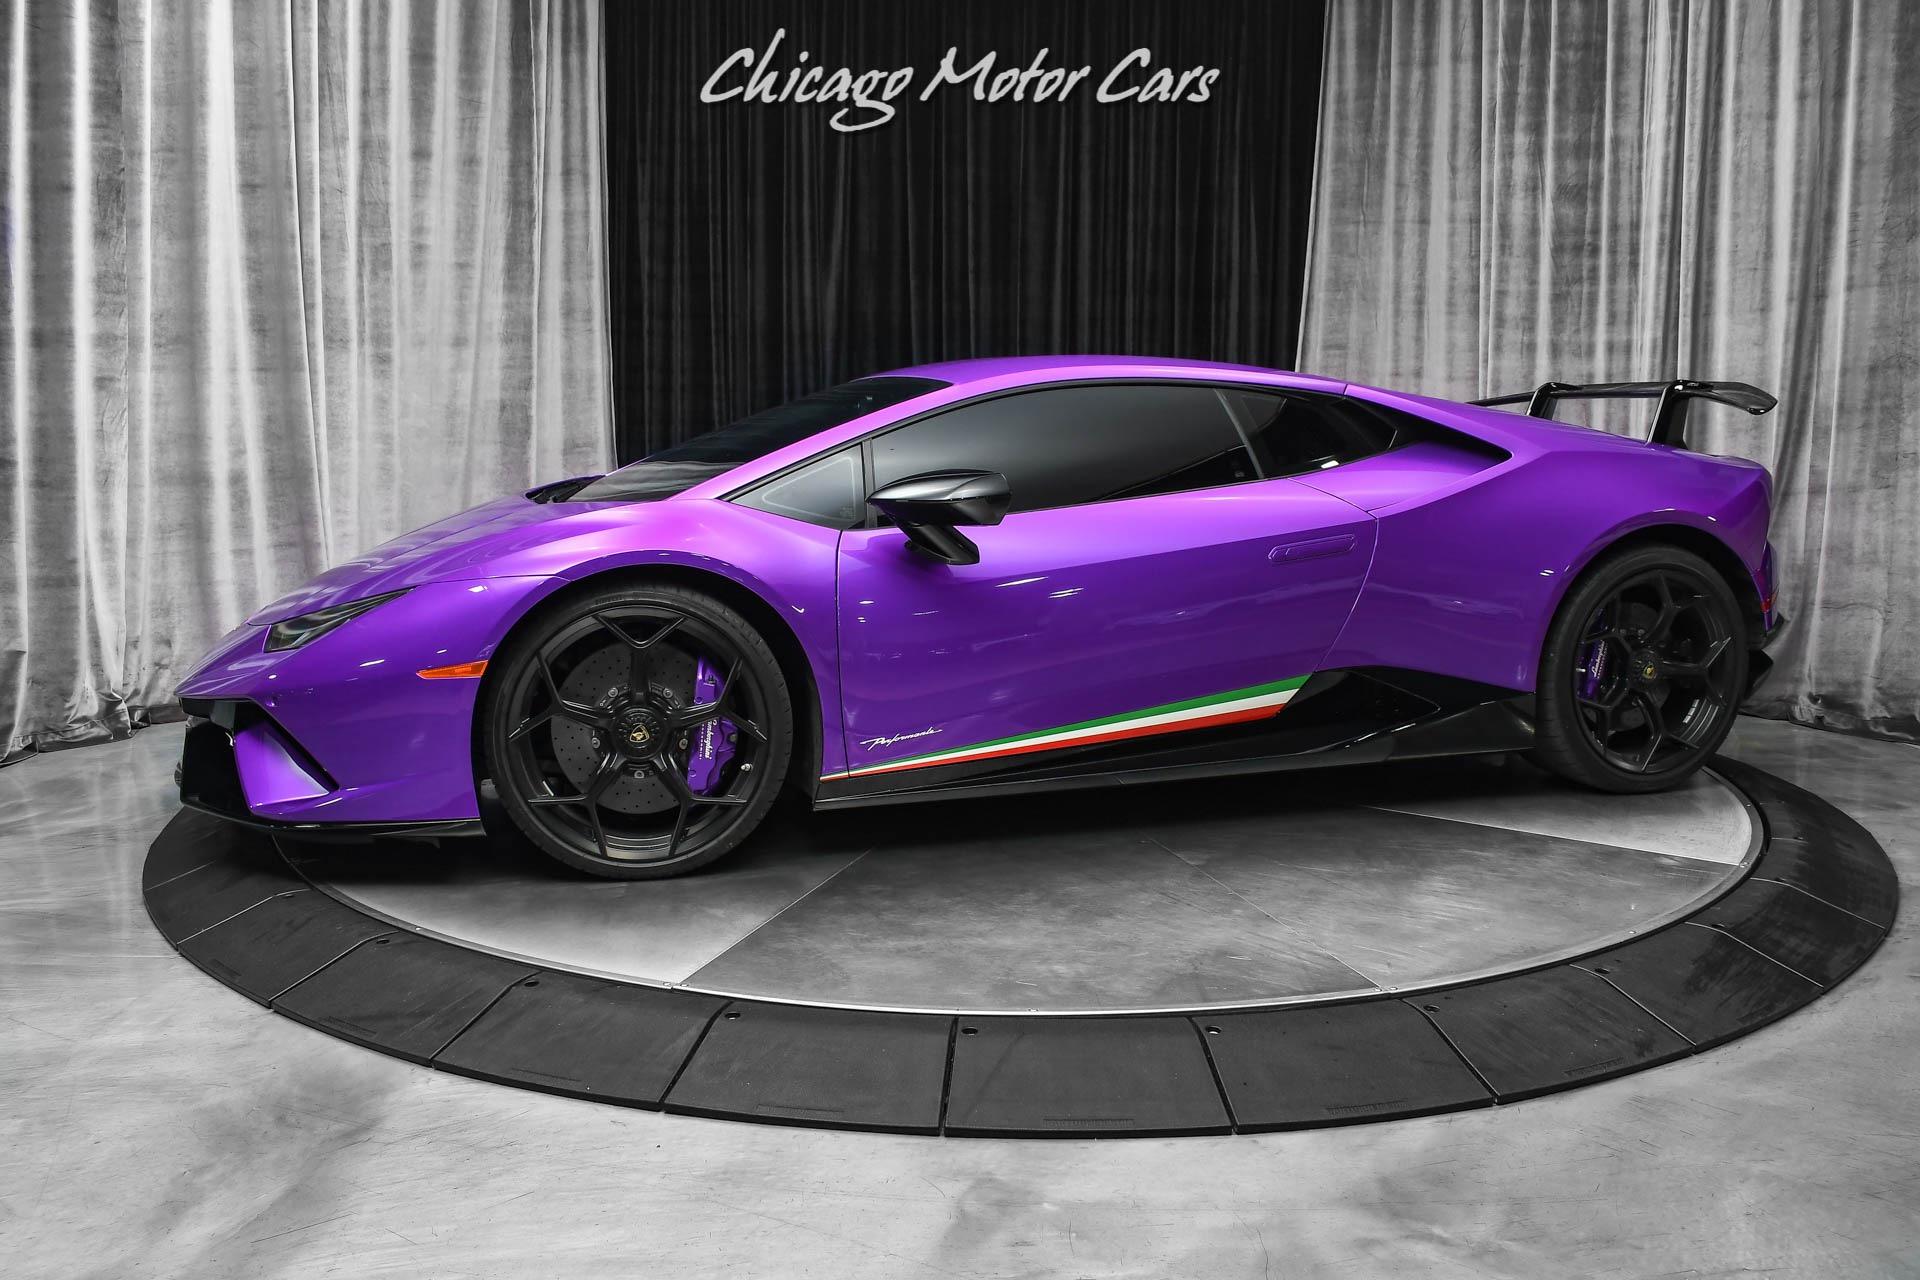 Used-2018-Lamborghini-Huracan-LP640-4-Performante-Coupe-Rare-Ad-Personam-Viola-Parsifae-Lift-System